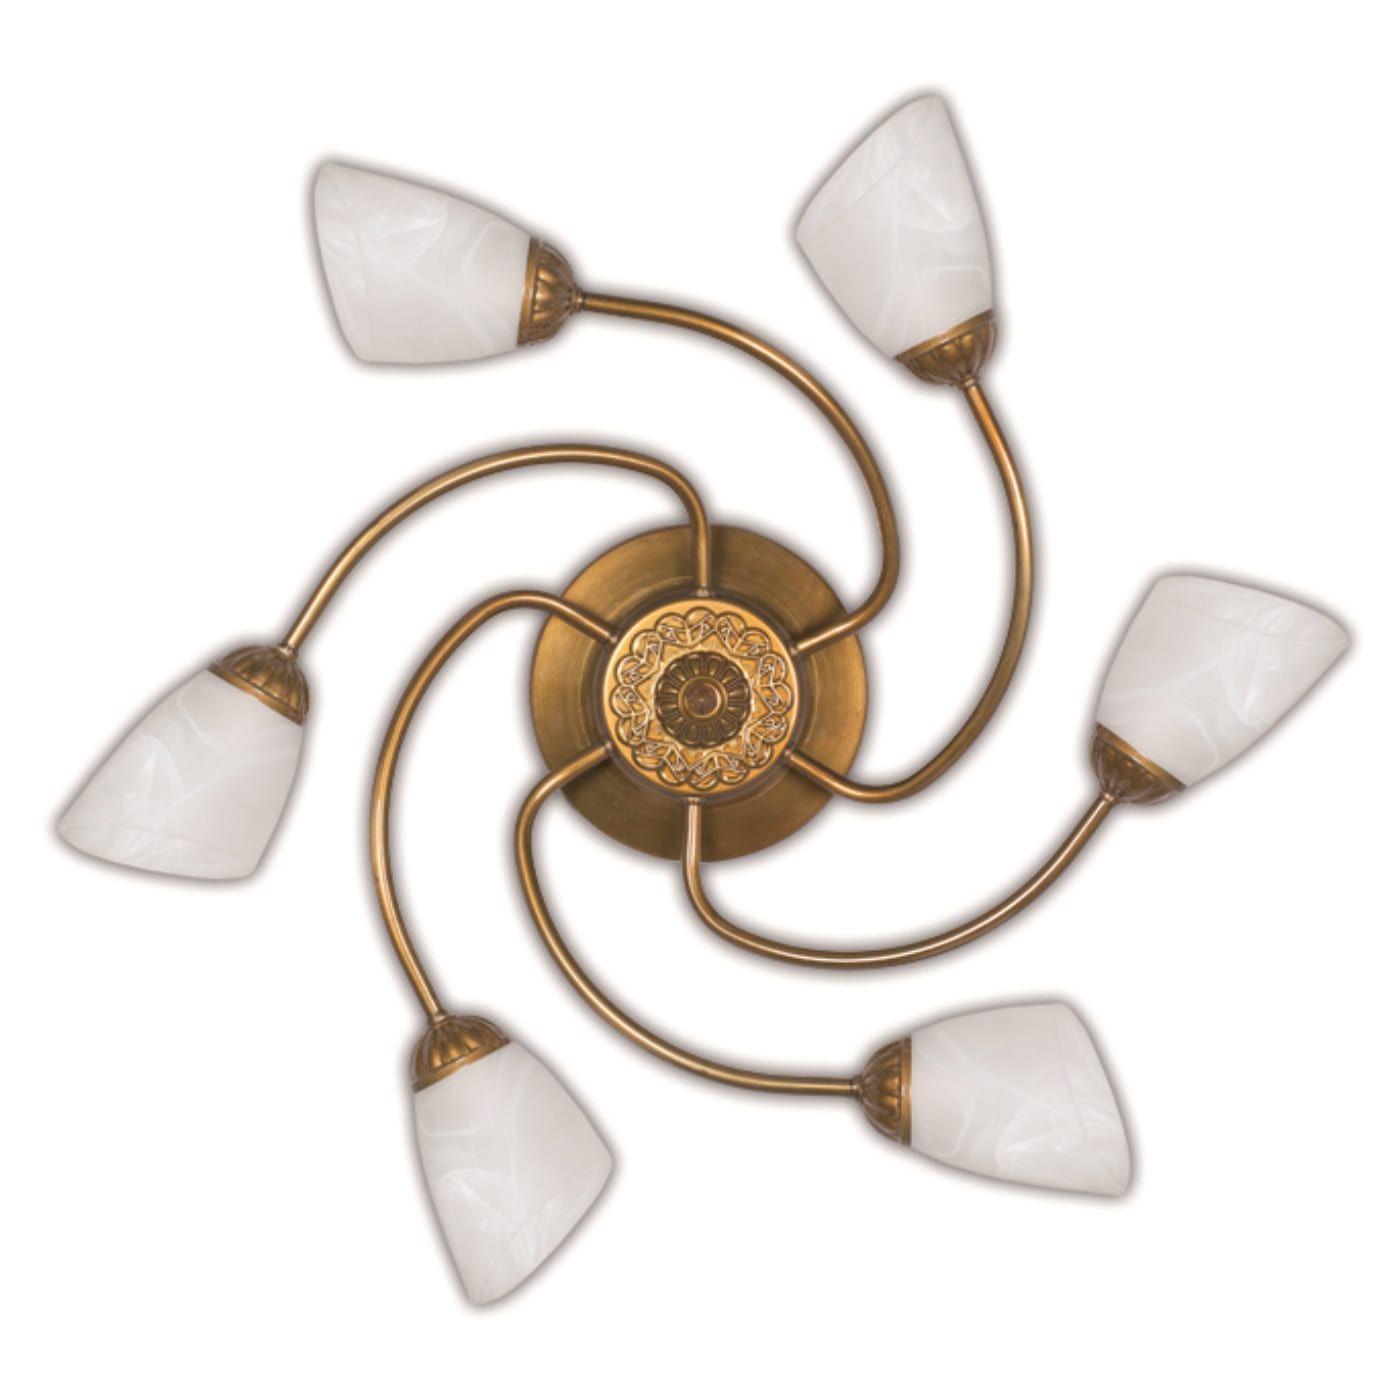 PETRASVET / Ceiling chandelier S2110-6, 6xE14 max. 60W